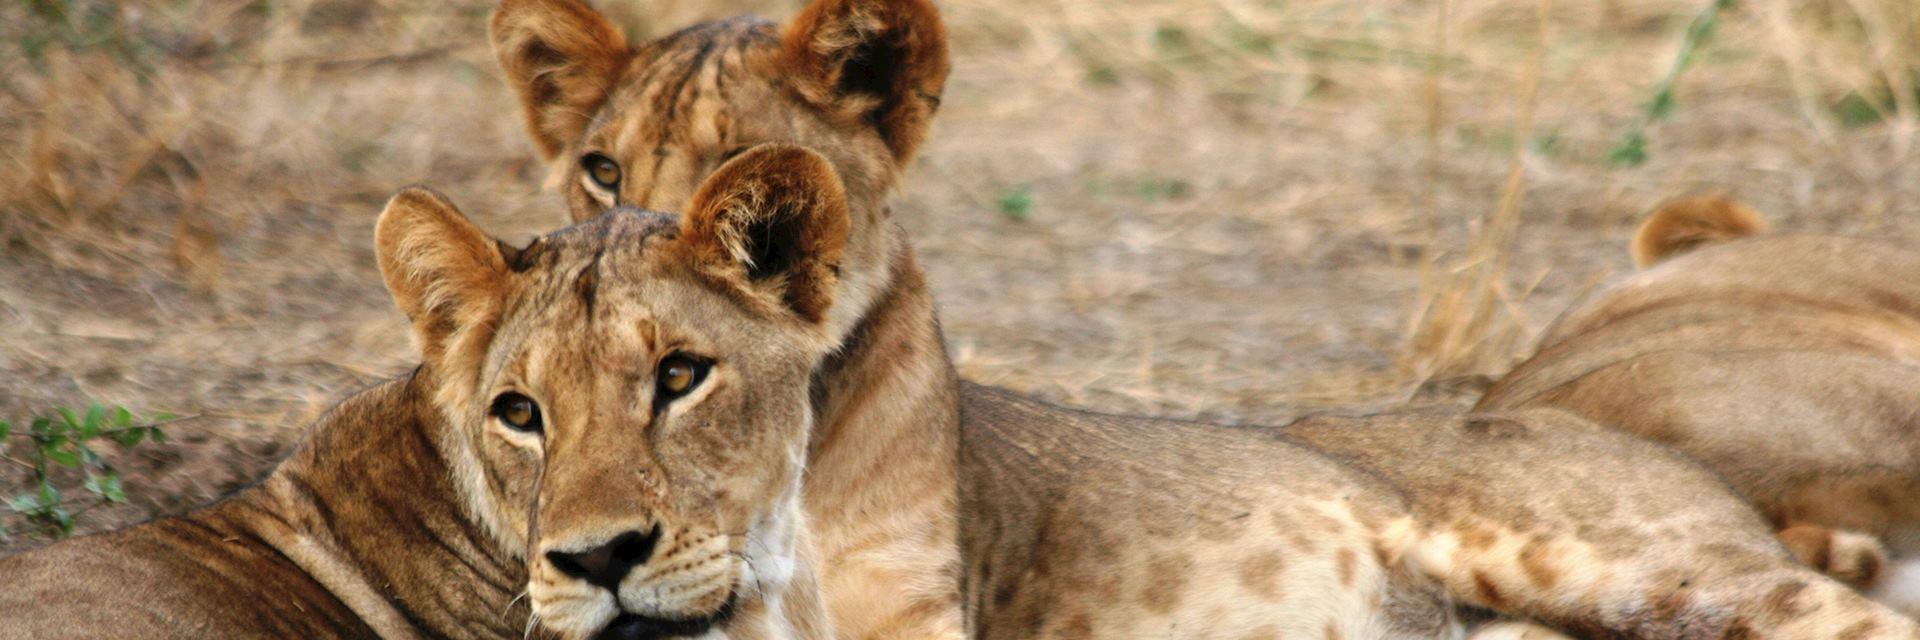 Lions, Lewa Wilderness Conservancy